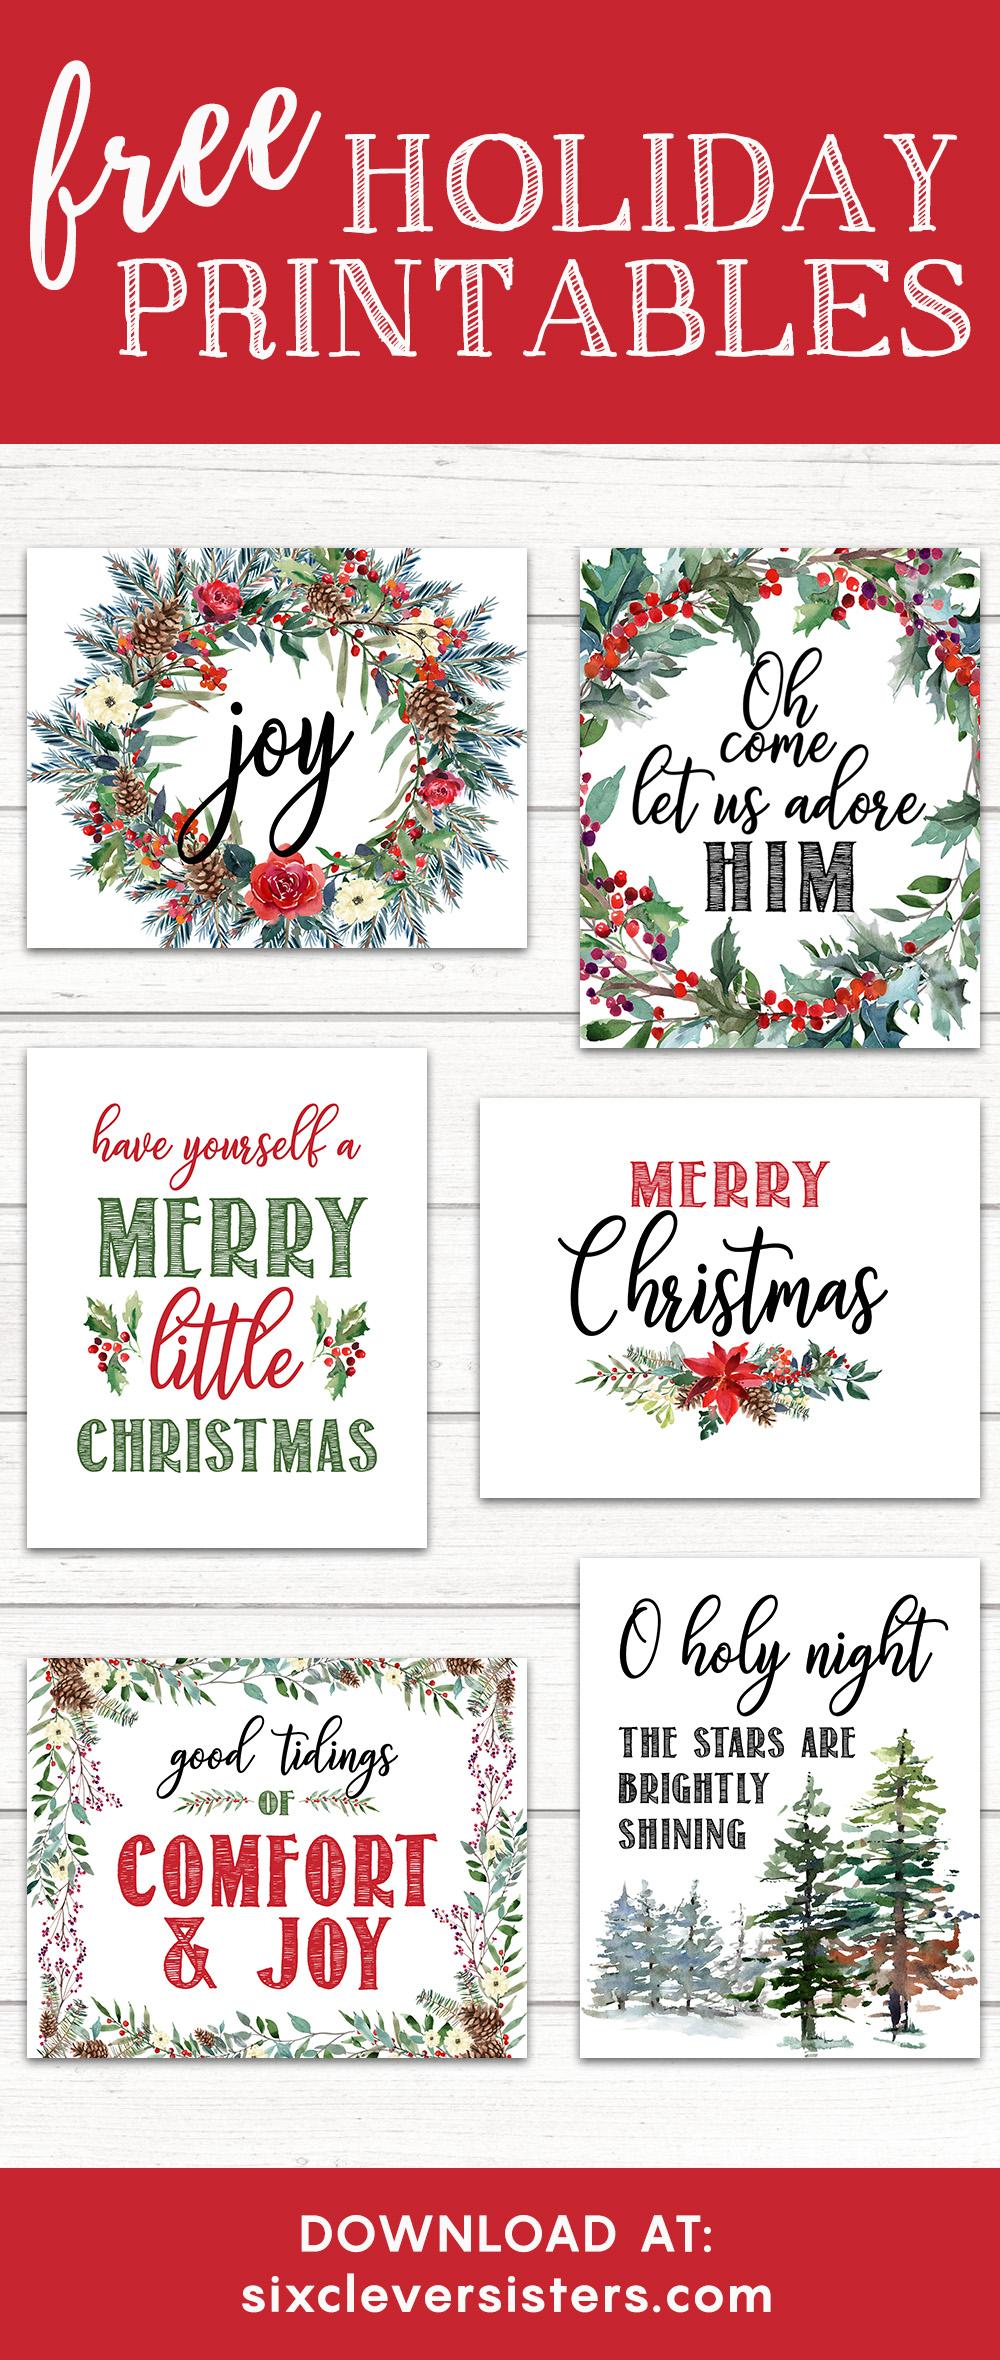 image regarding Printable Merry Christmas Sign named 6 No cost Printable Xmas Indications - 6 Smart Sisters